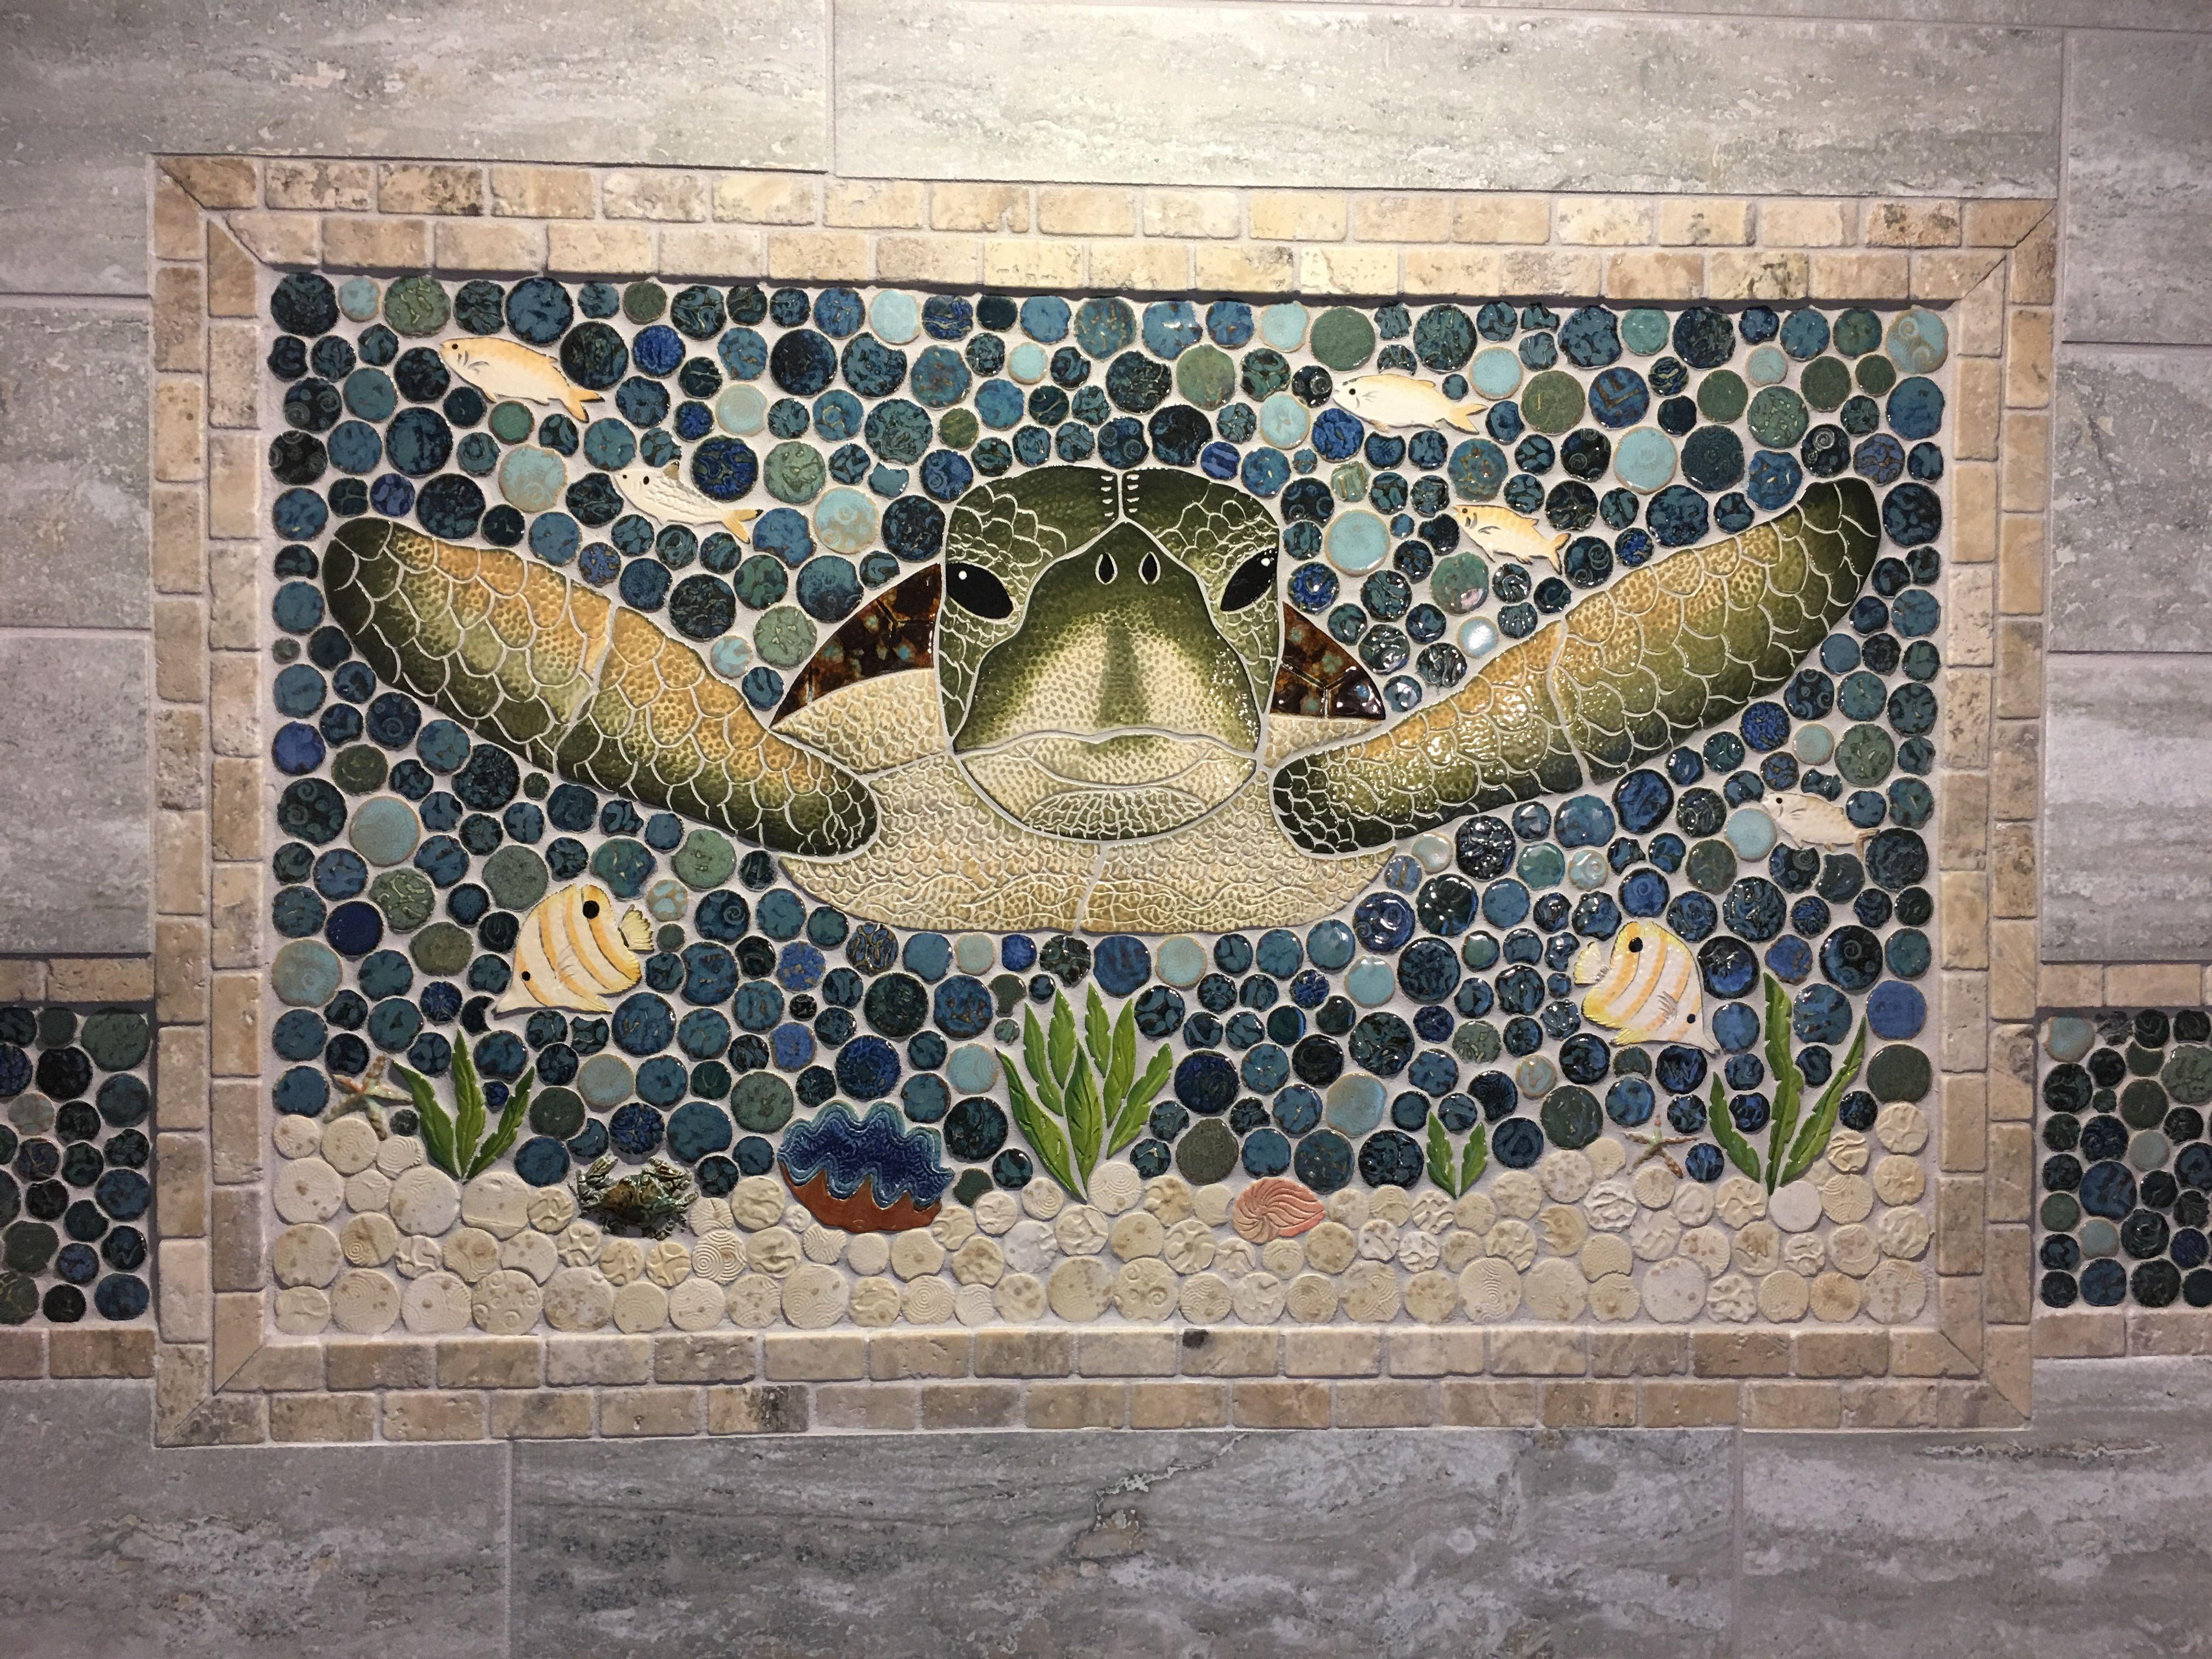 New hand cut ceramic tile sea turtle mosaic shower insert new hand cut ceramic tile sea turtle mosaic shower insert doublecrazyfo Gallery